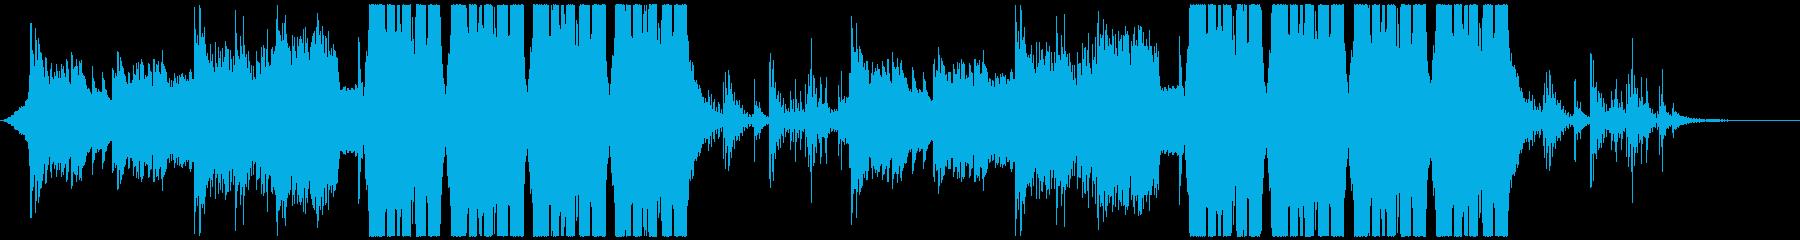 Future Bass シネマティックの再生済みの波形